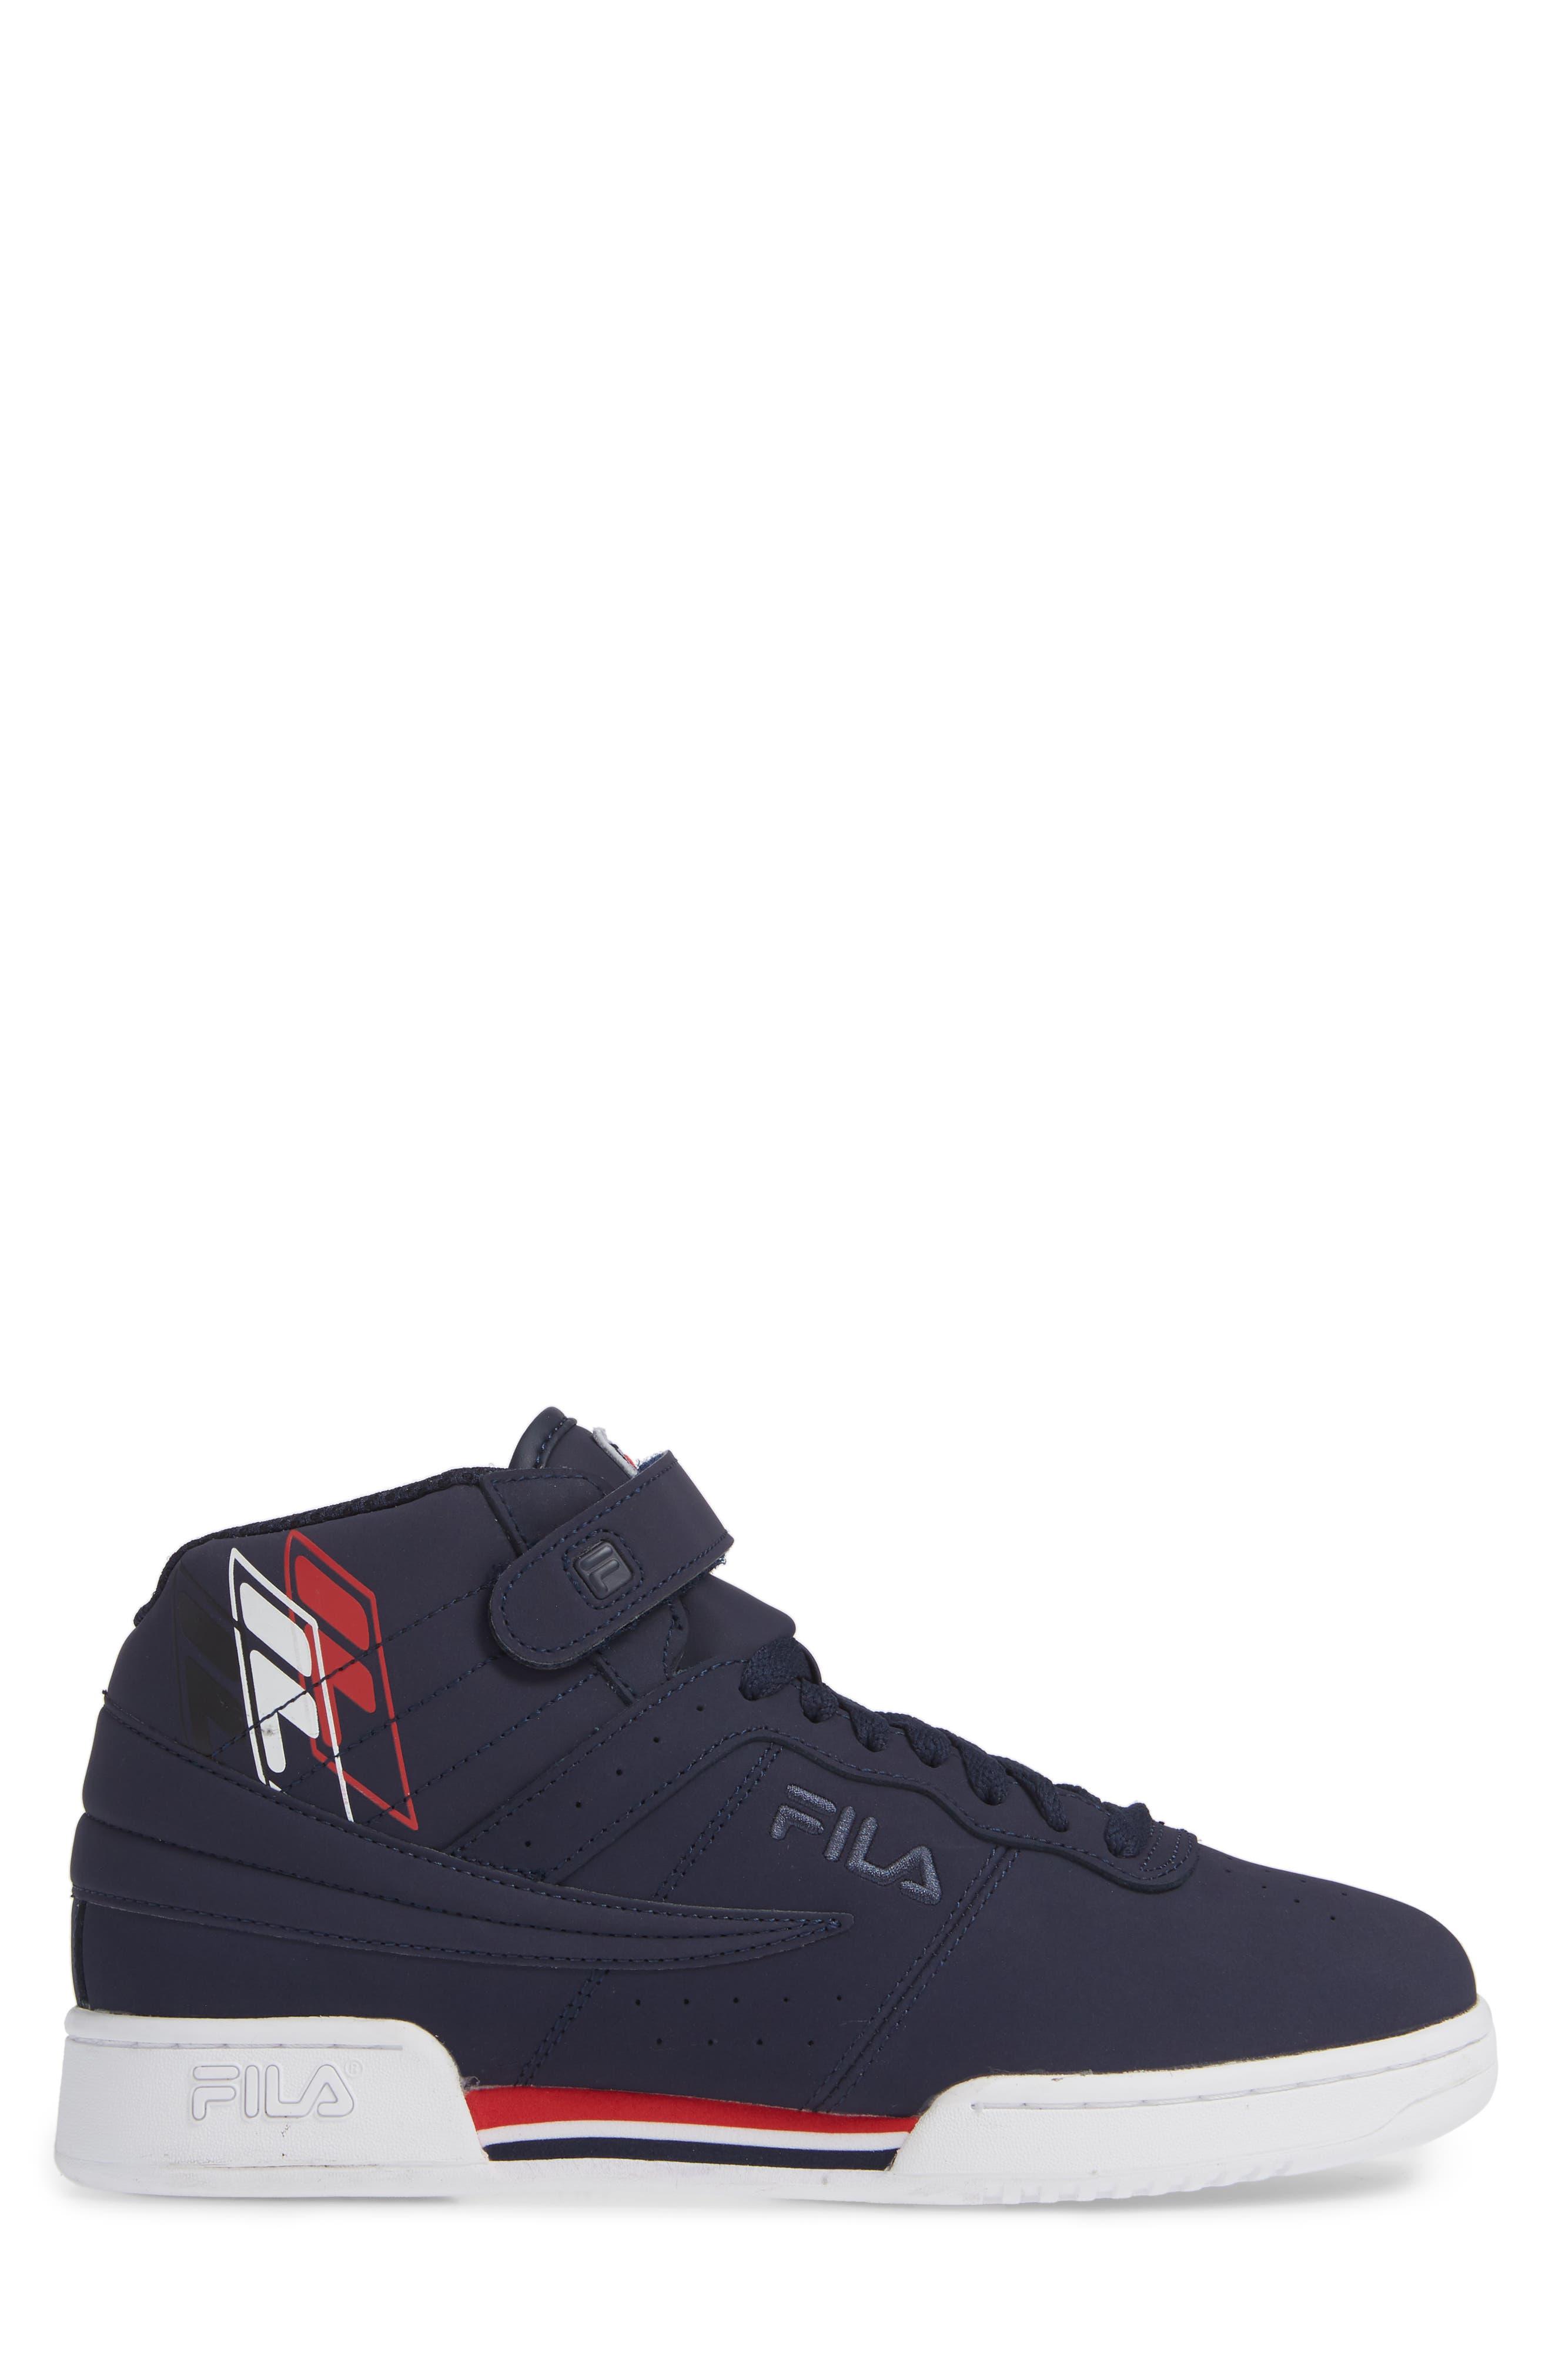 F-13 F-Box Sneaker,                             Alternate thumbnail 3, color,                             NAVY/ WHITE/ RED